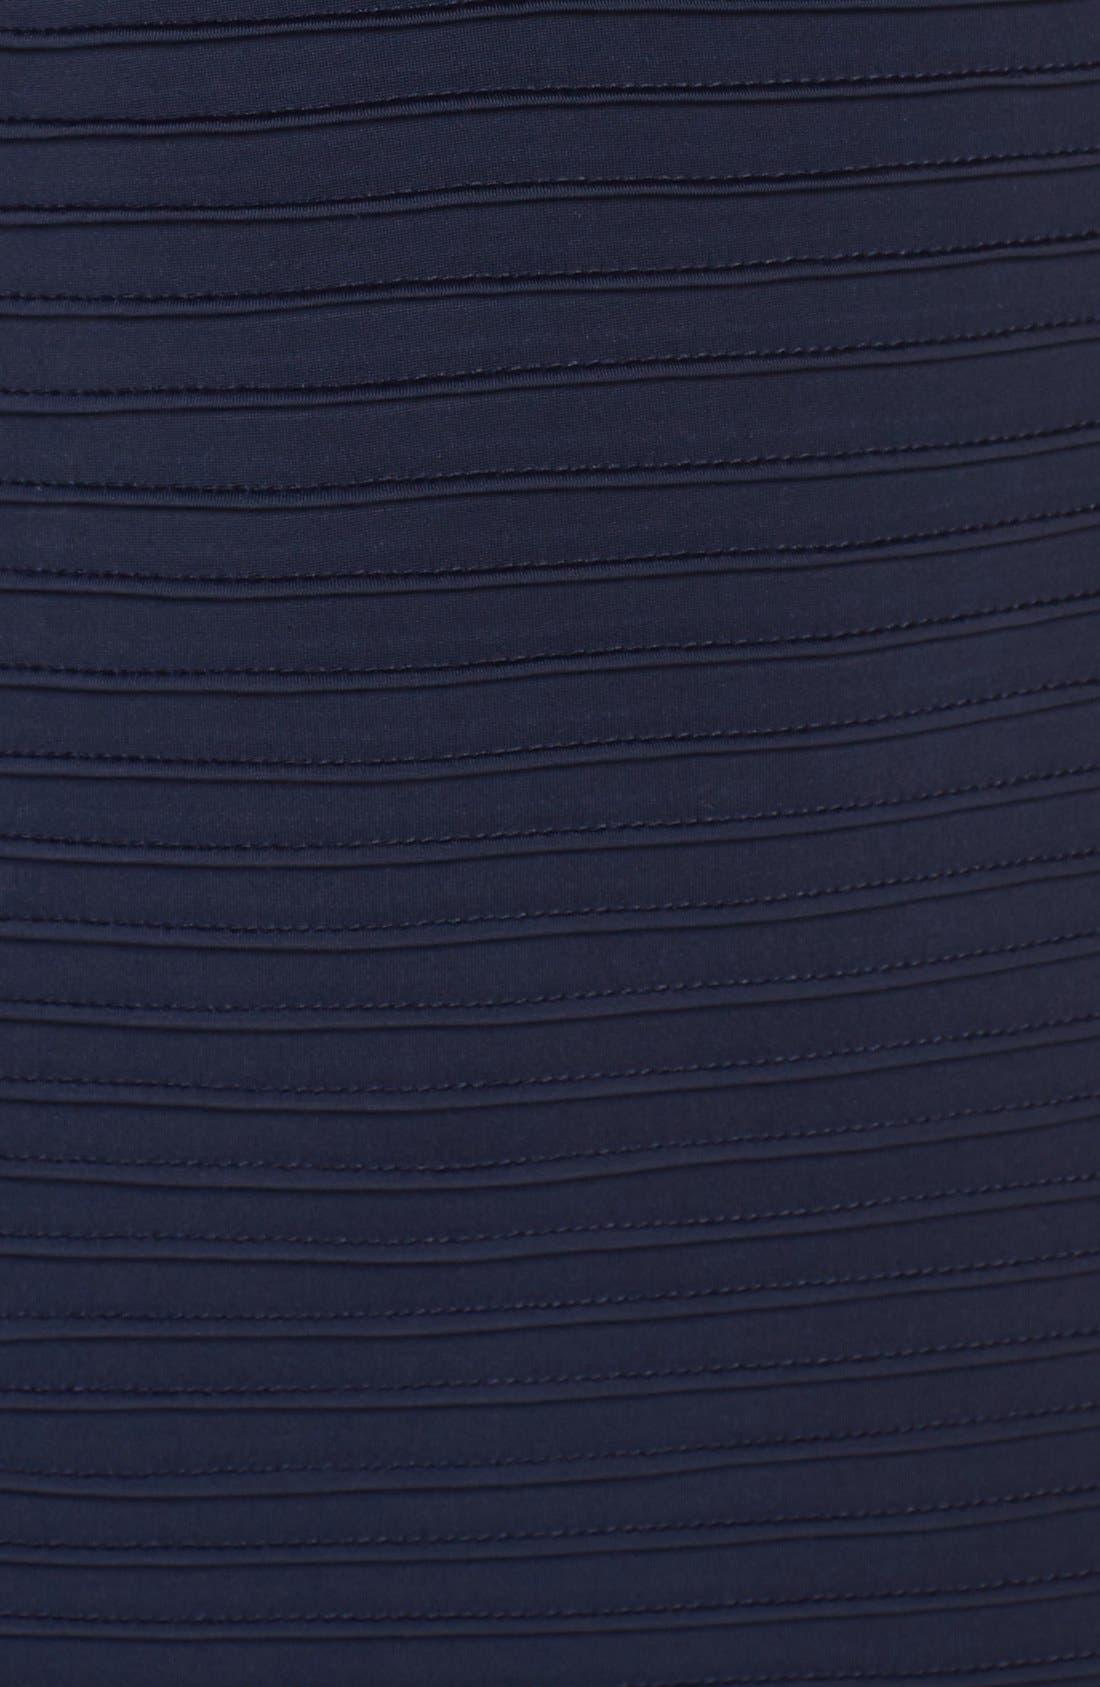 Lace & Jersey Sheath Dress,                             Alternate thumbnail 7, color,                             412